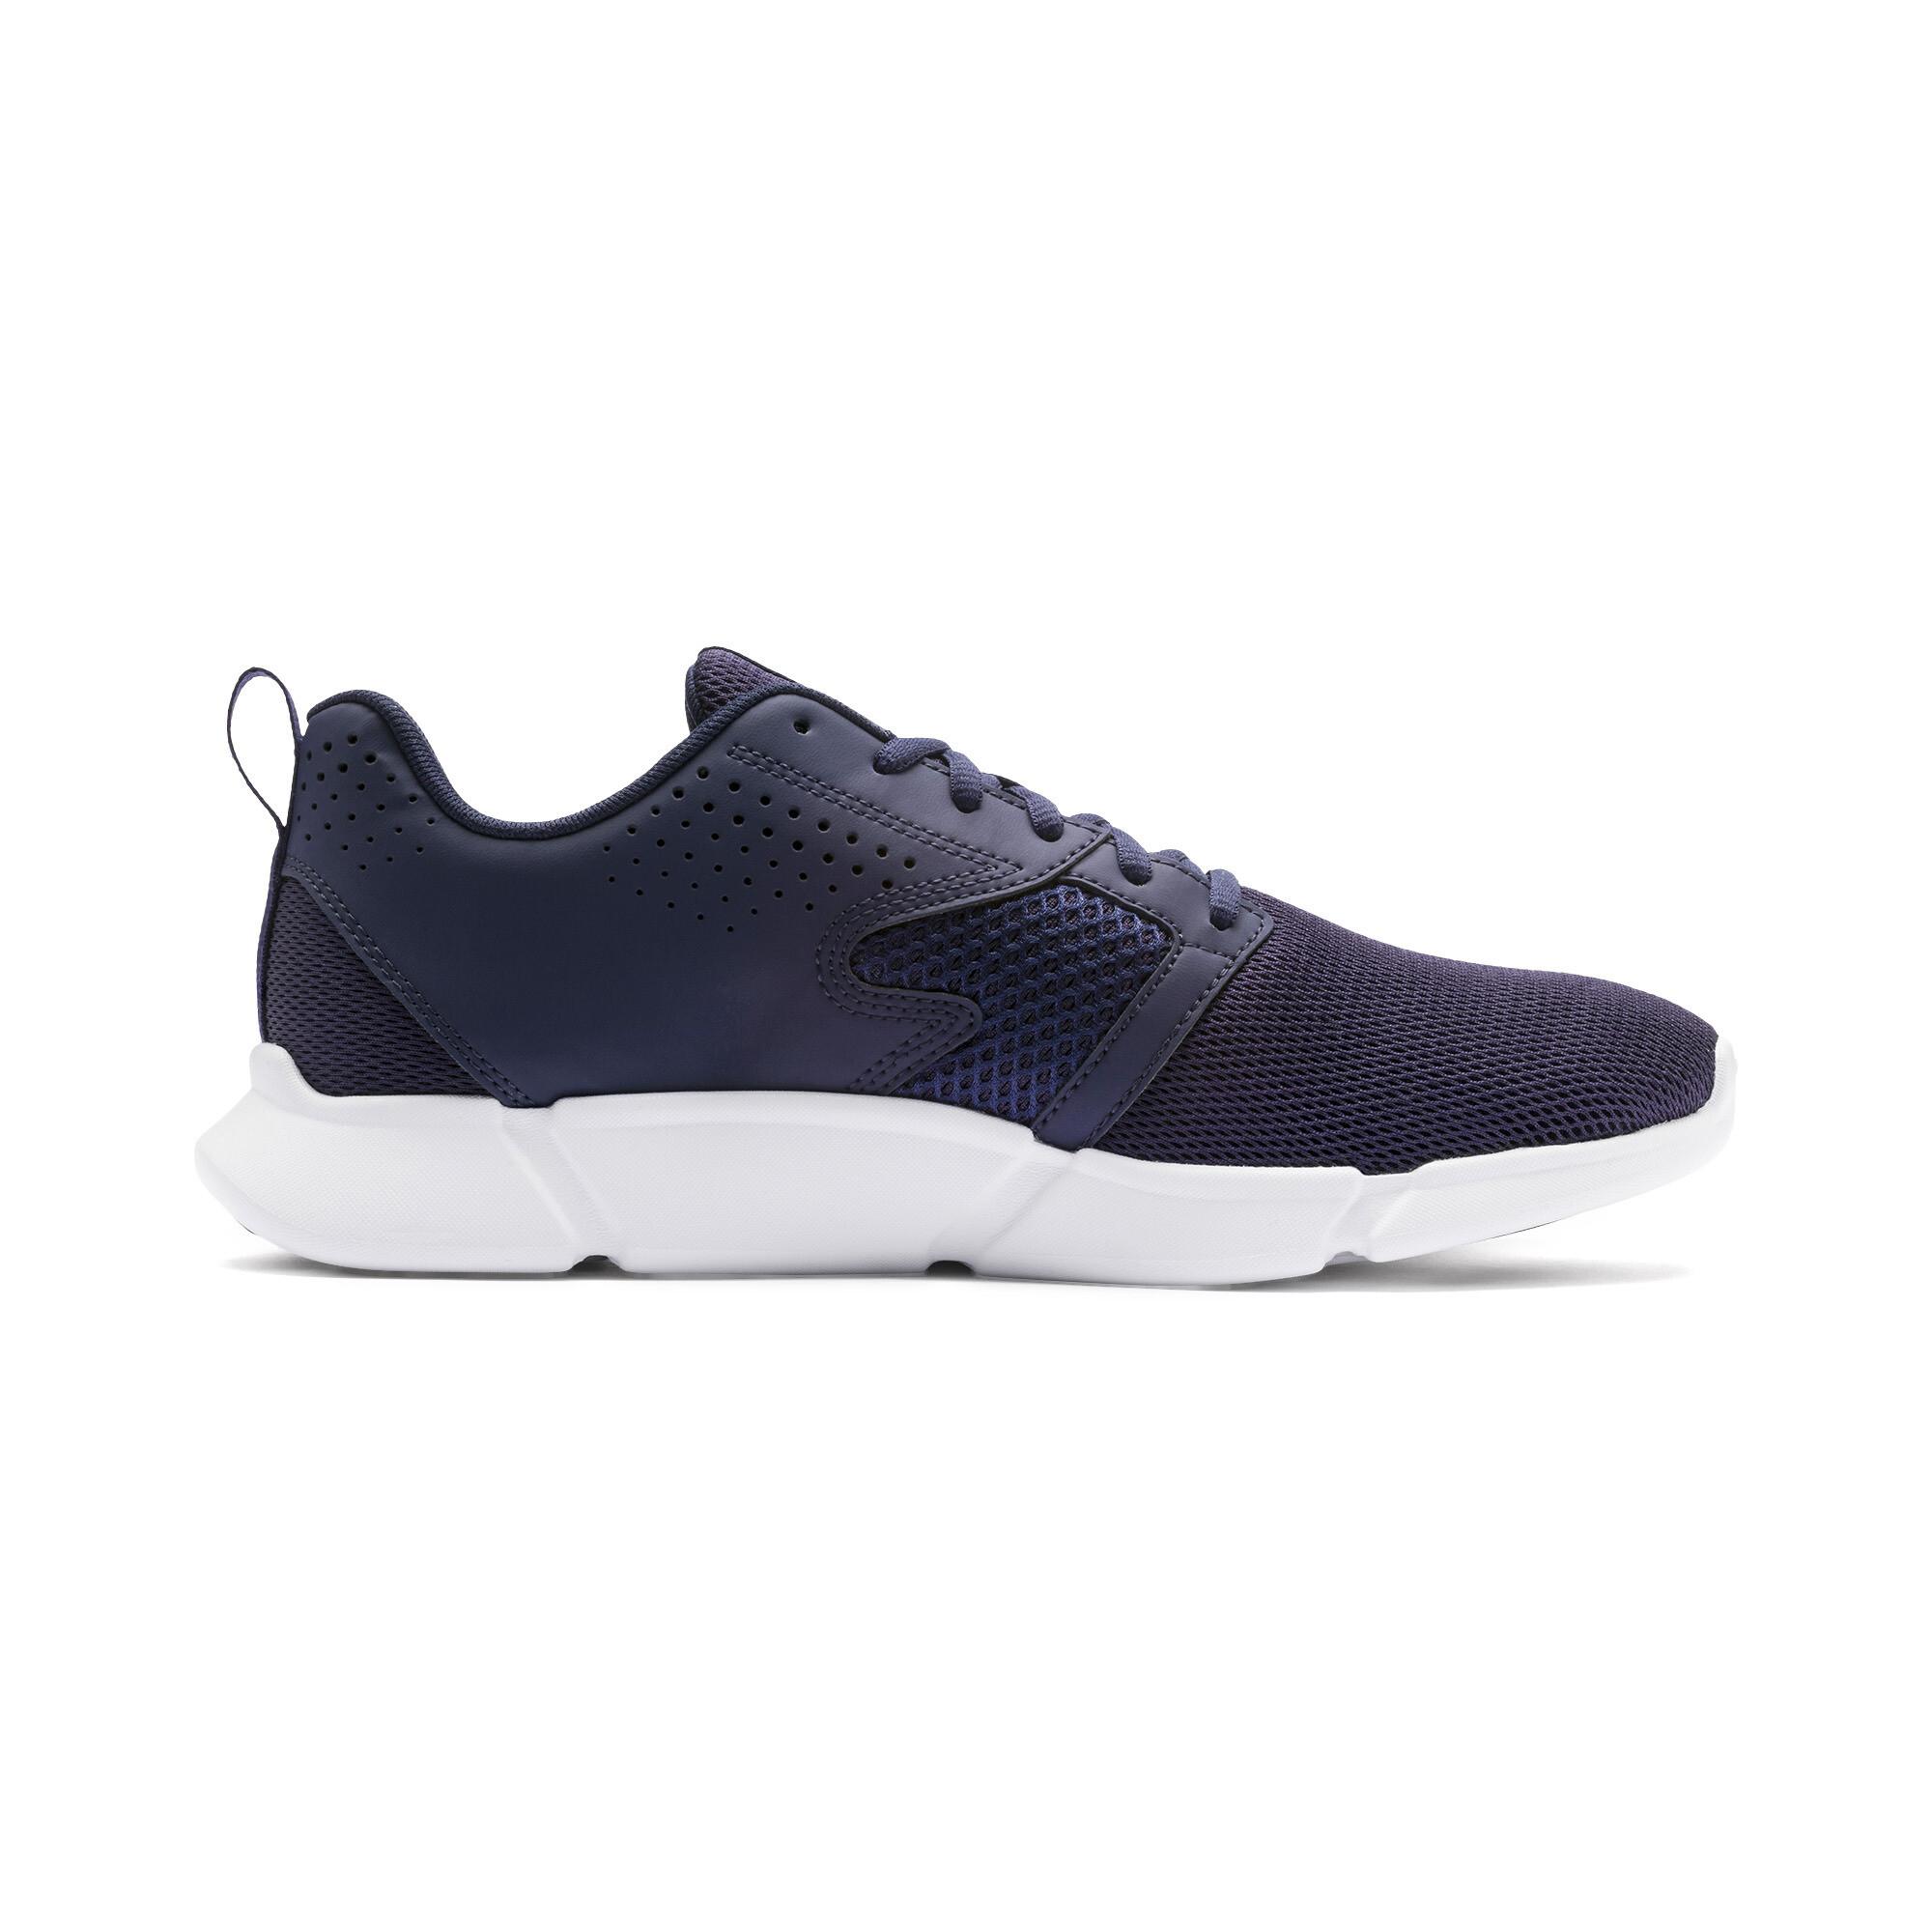 PUMA-INTERFLEX-Modern-Men-039-s-Sneakers-Unisex-Shoe-Running thumbnail 7